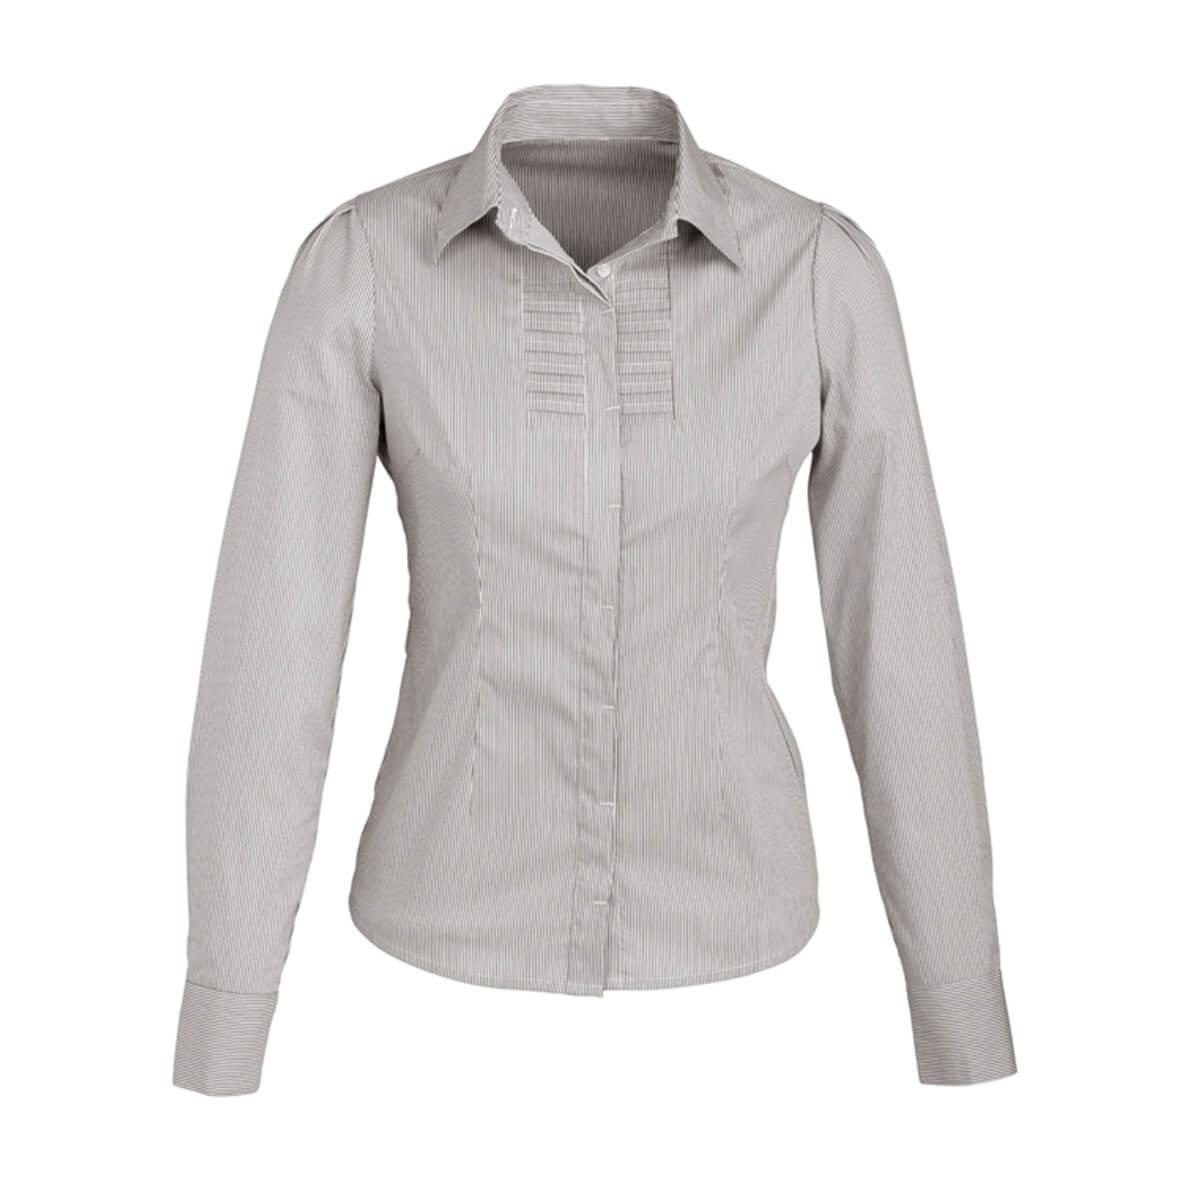 Ladies Berlin Long Sleeve Shirt-Graphite Stripe